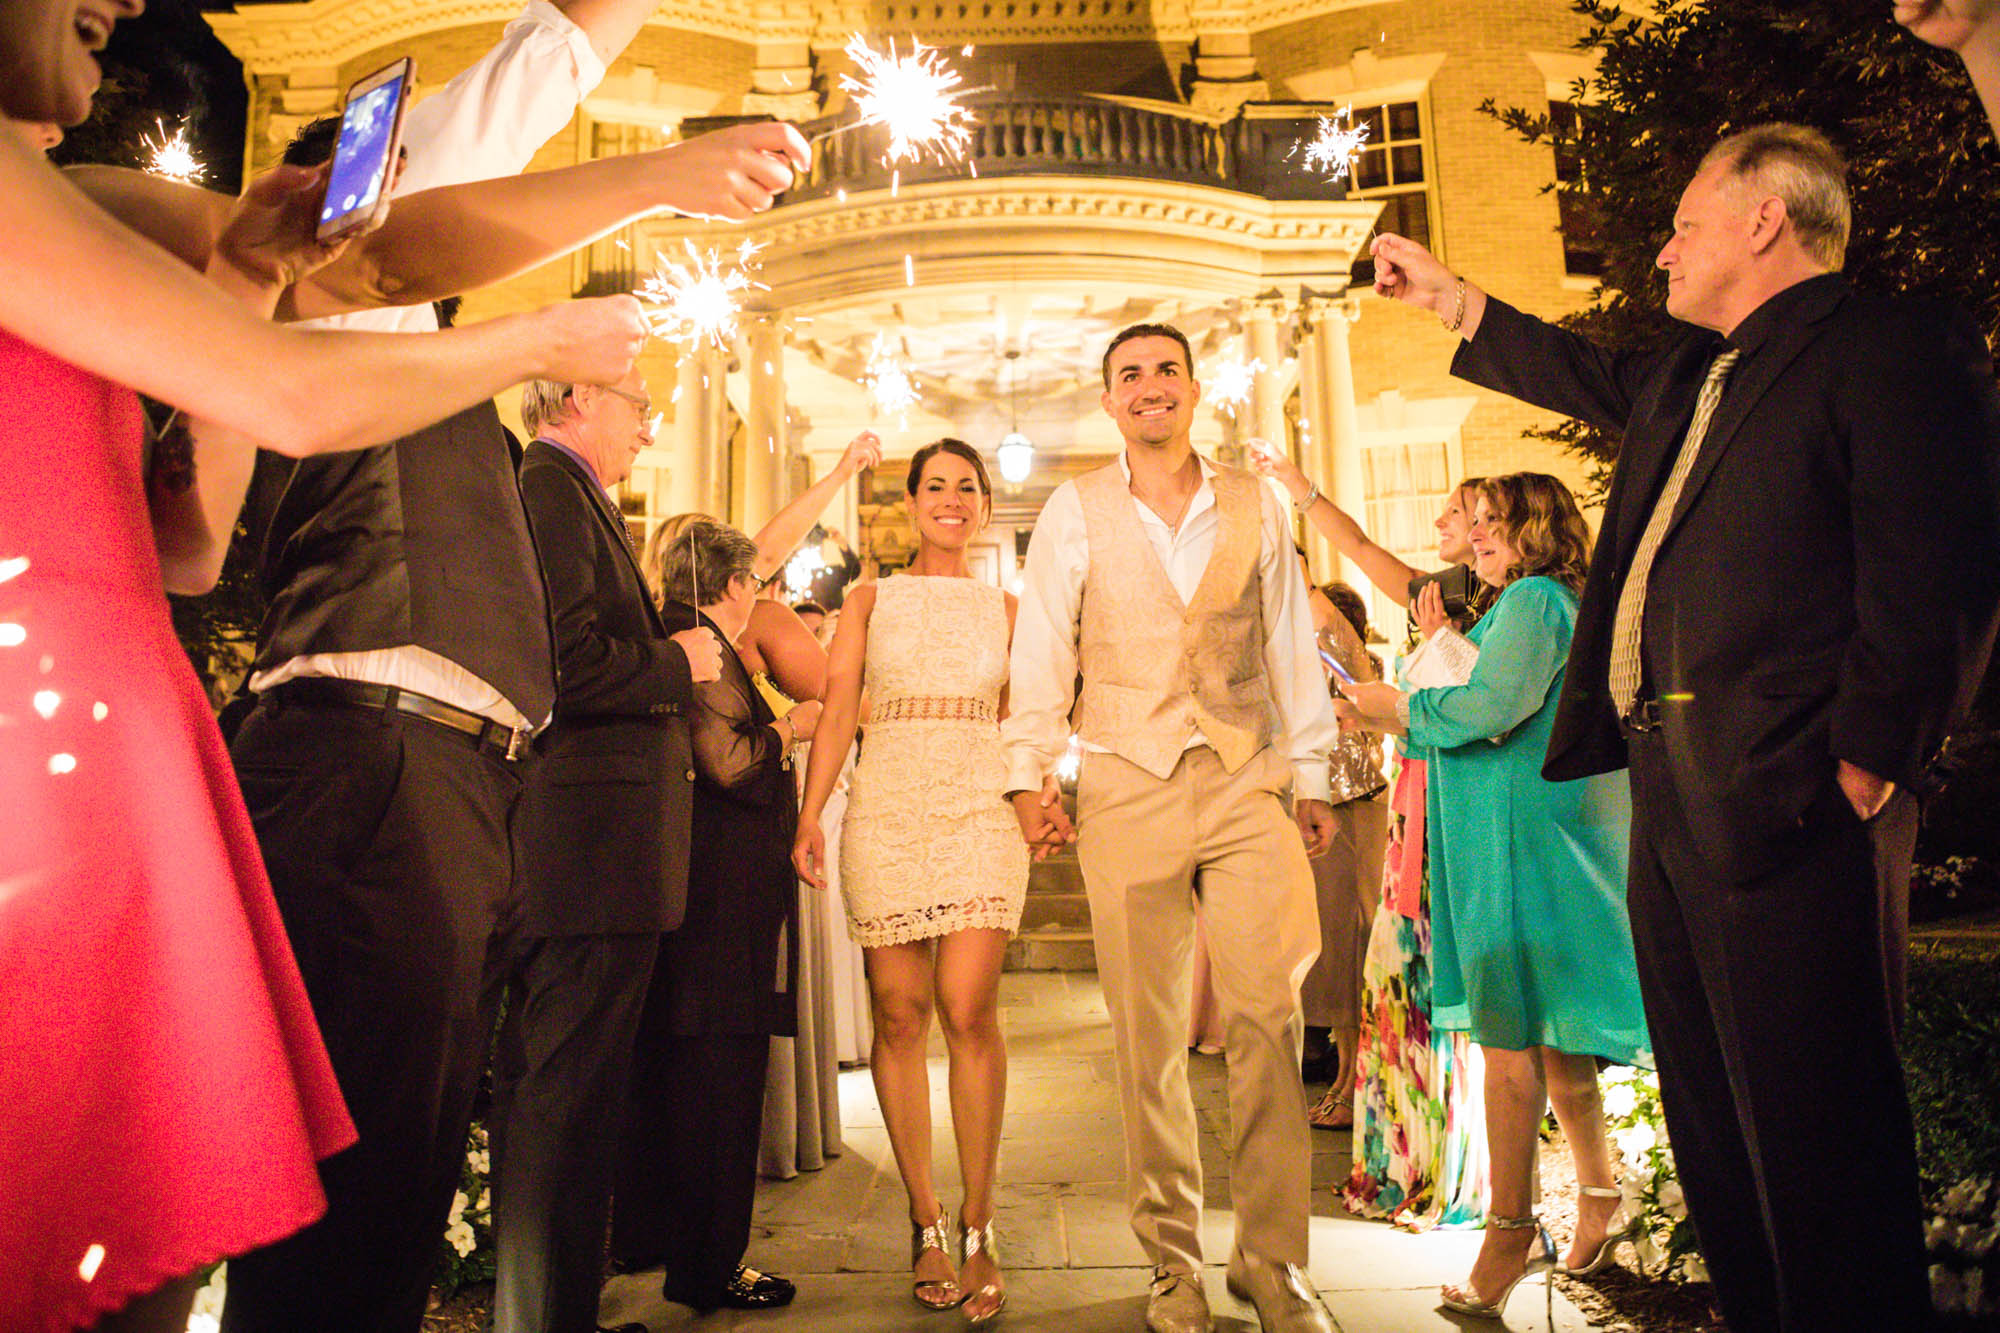 scranton_wedding_photographer_lettieri_pa-0990.jpg